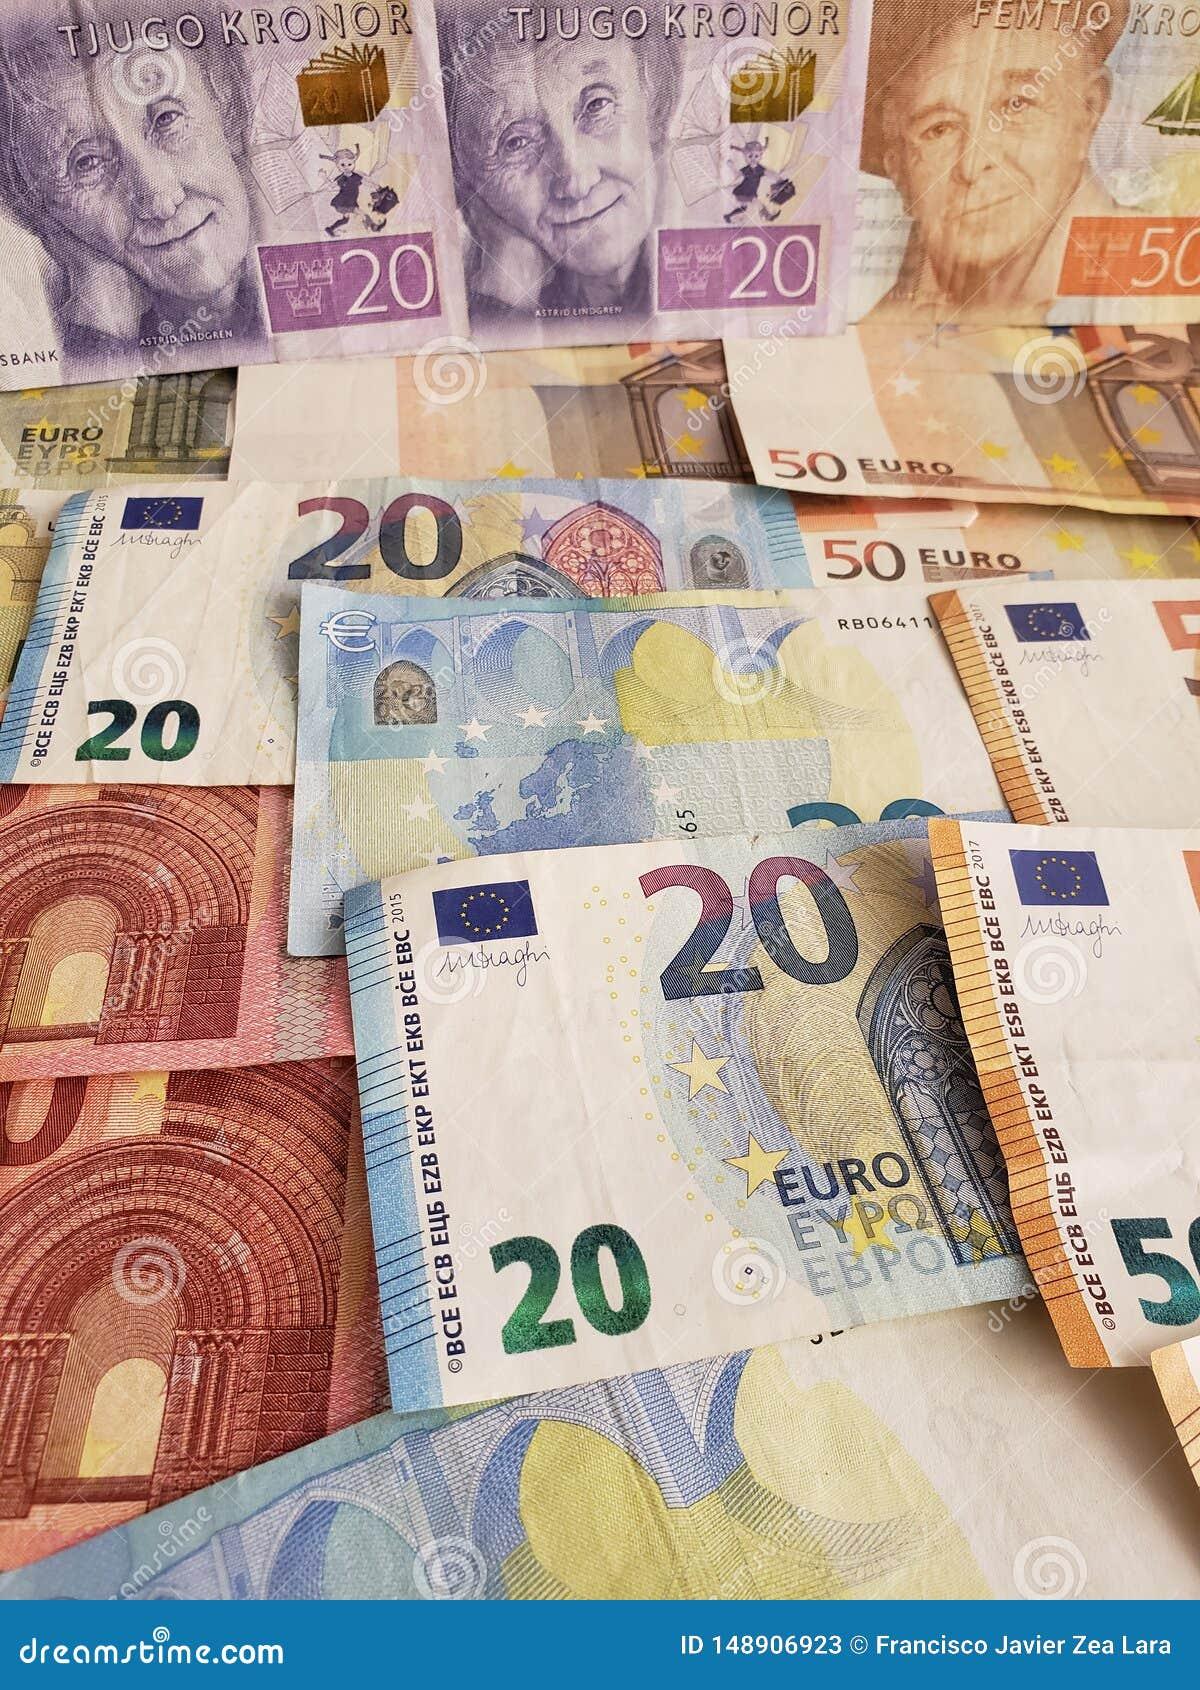 Femtio kronor in euro